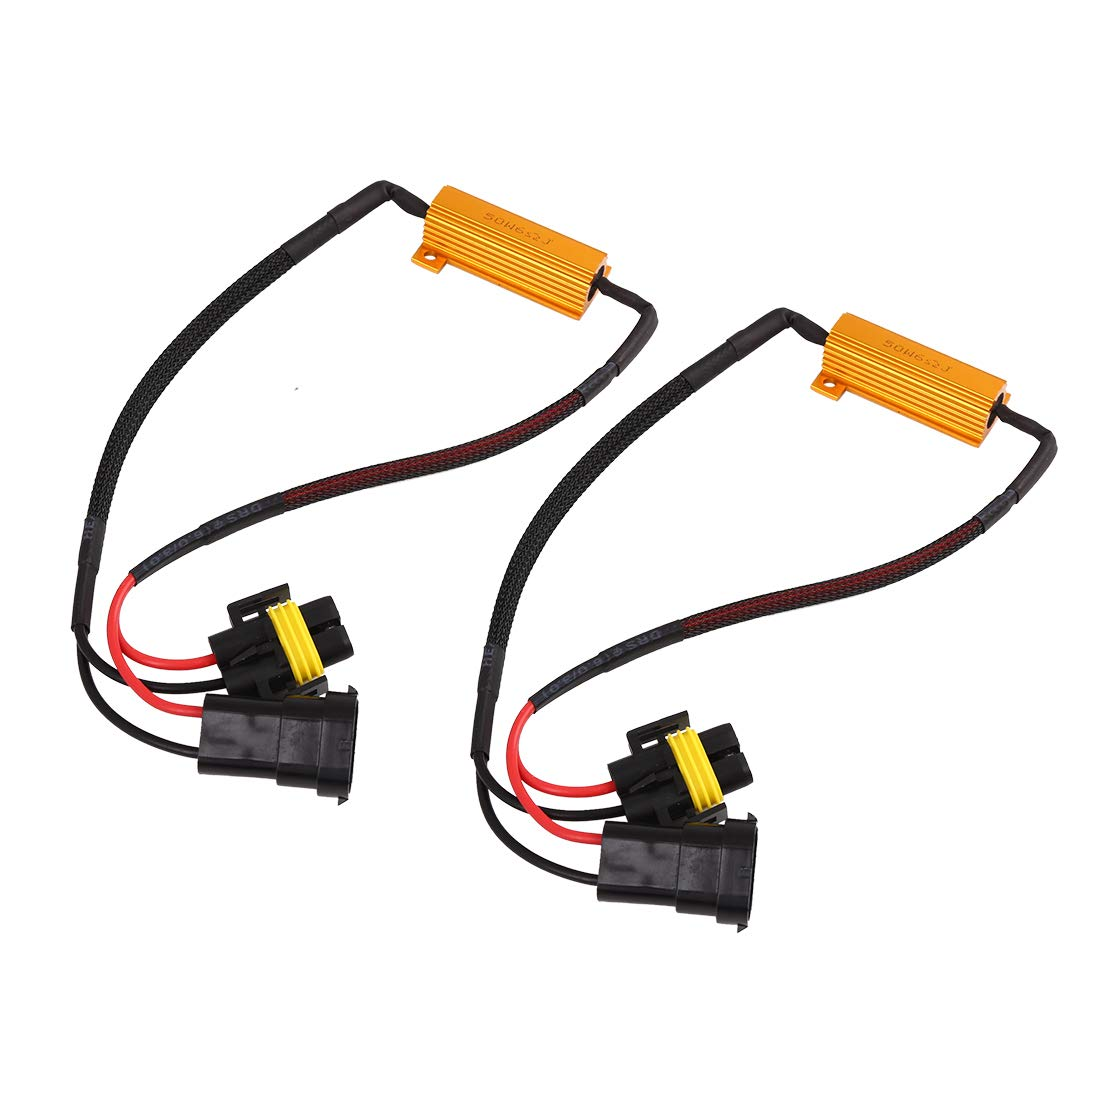 X AUTOHAUX H7 LED Light Canbus Decoder Anti Flicker Dual Resistor Canceller 2pcs